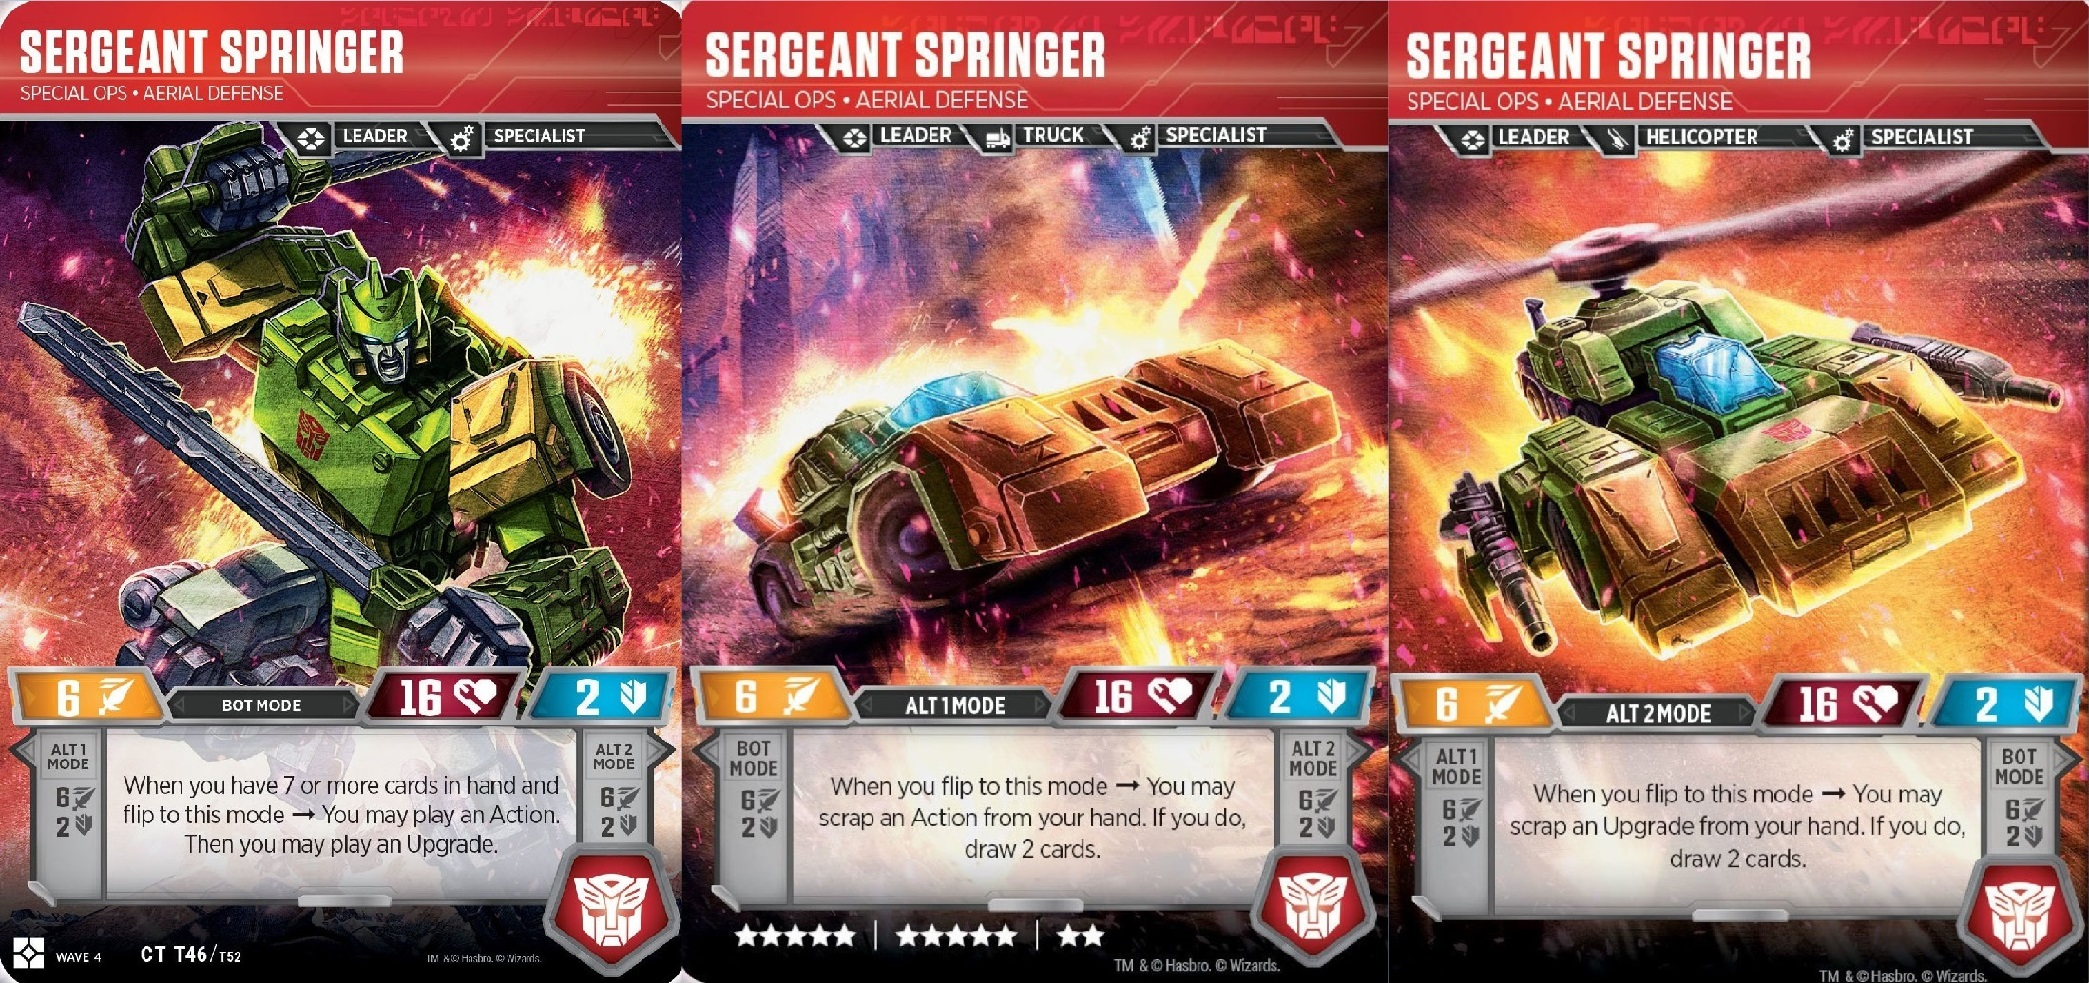 Sergeant Springer // Special Ops Aerial Defense